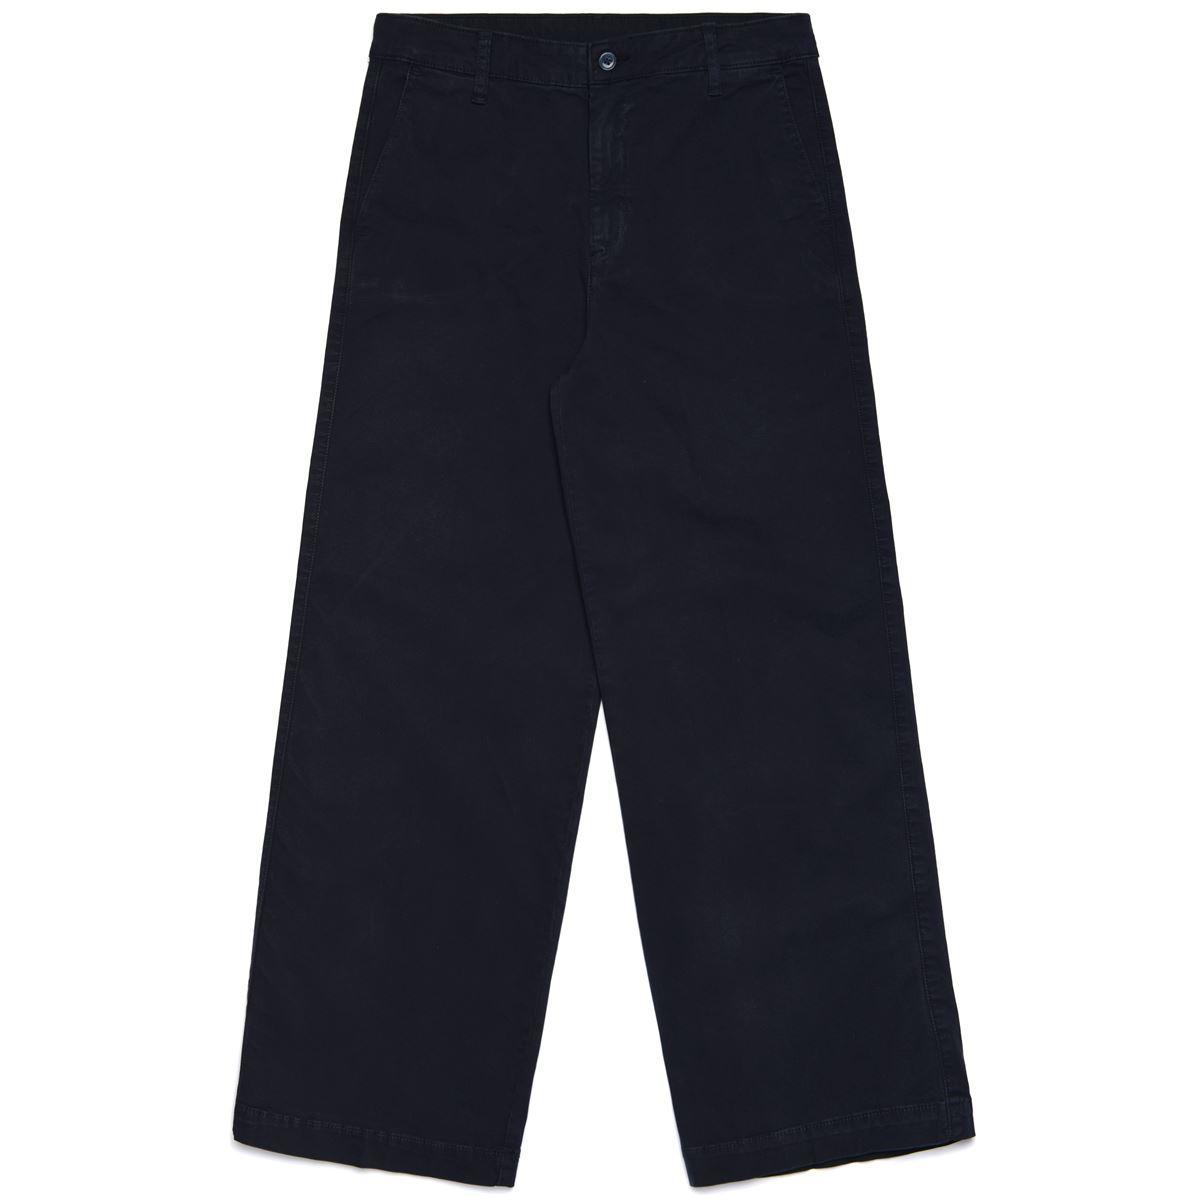 Robe di Kappa Pantaloni donna-601NLR0